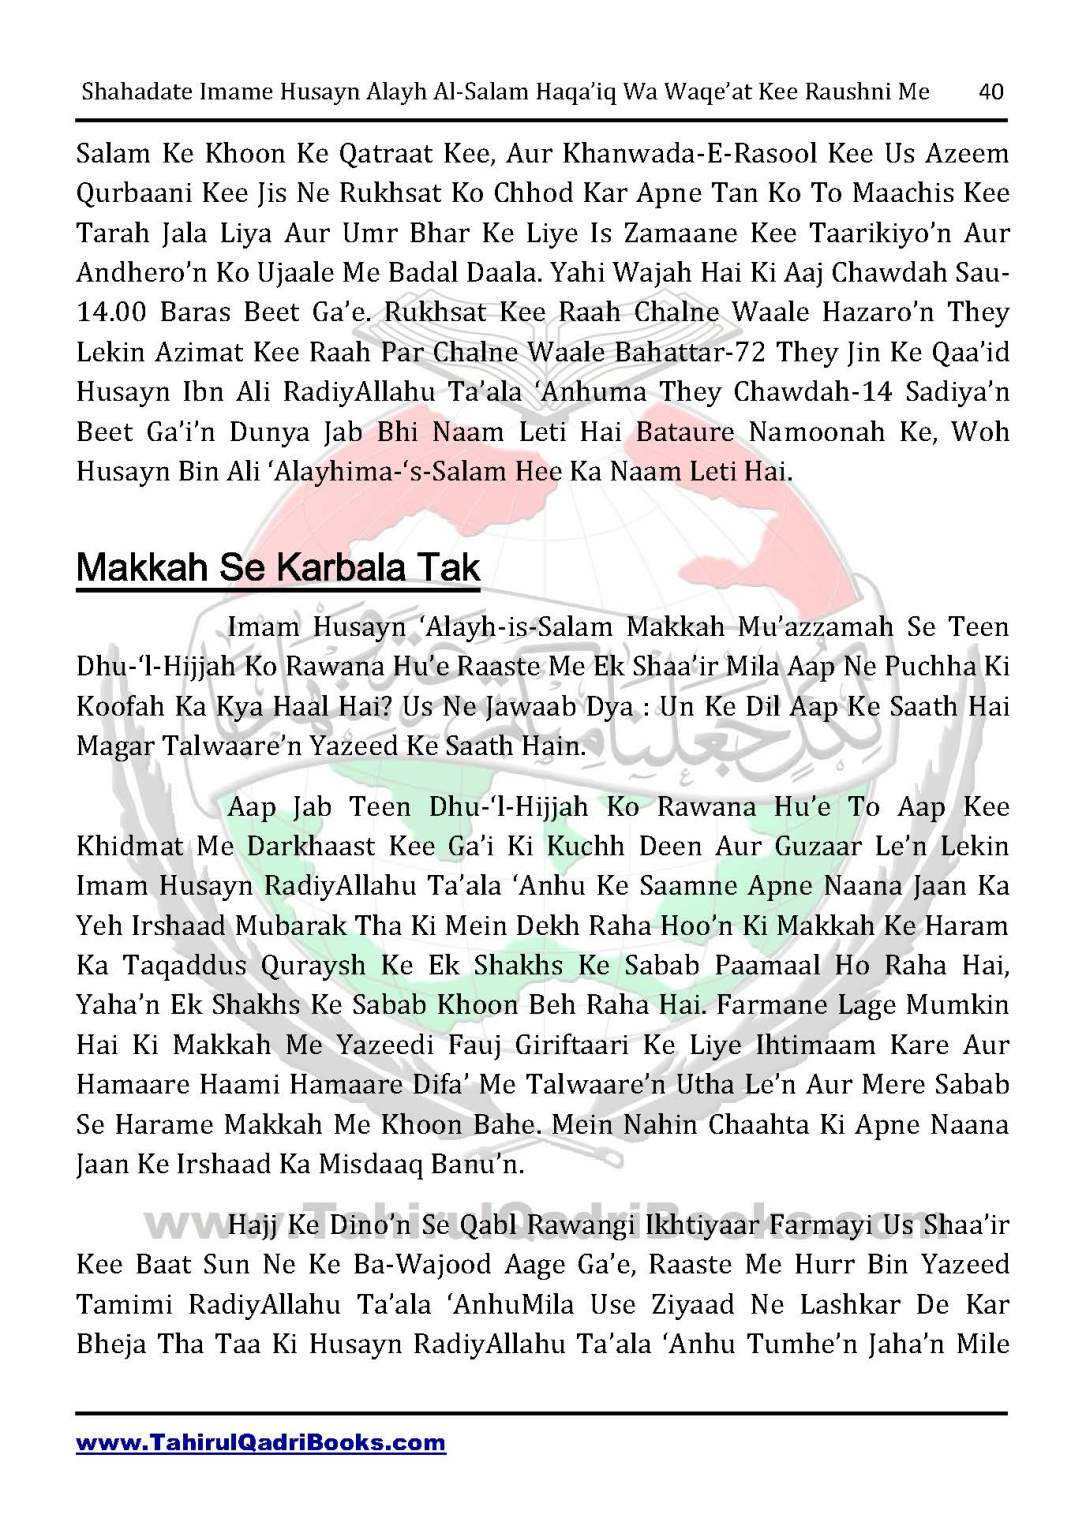 shahadate-imame-husayn-alayh-is-salam-haqaiq-wa-waqe_at-kee-raushni-me-in-roman-urdu-unlocked_Page_40